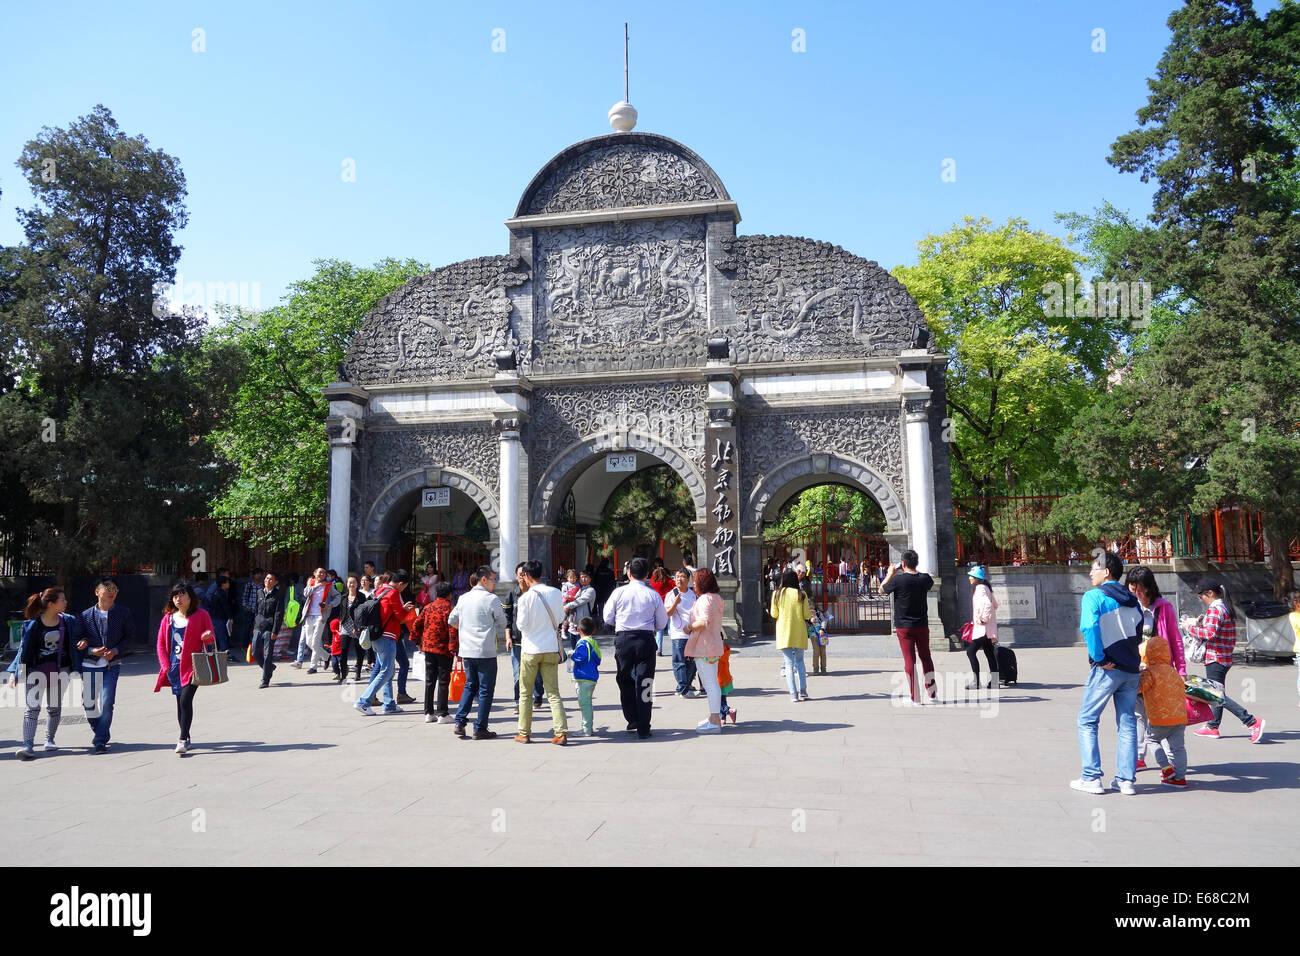 Beijing Zoo entrance, Xicheng District, China - Stock Image